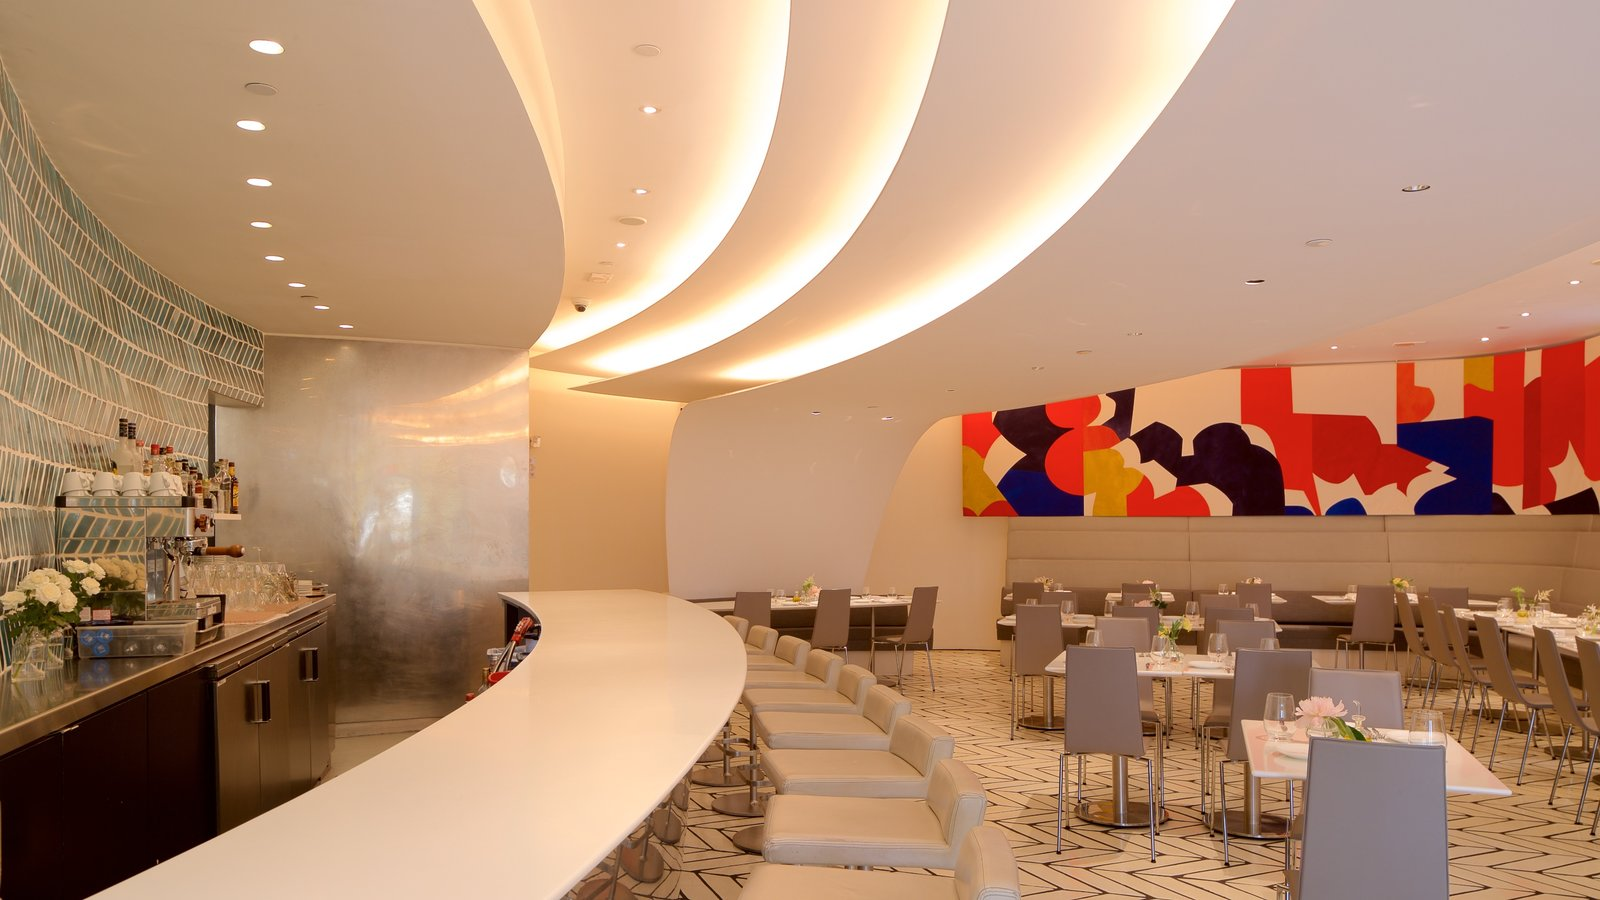 Solomon R. Guggenheim Museum Pictures: View Photos ...  Guggenheim Inside